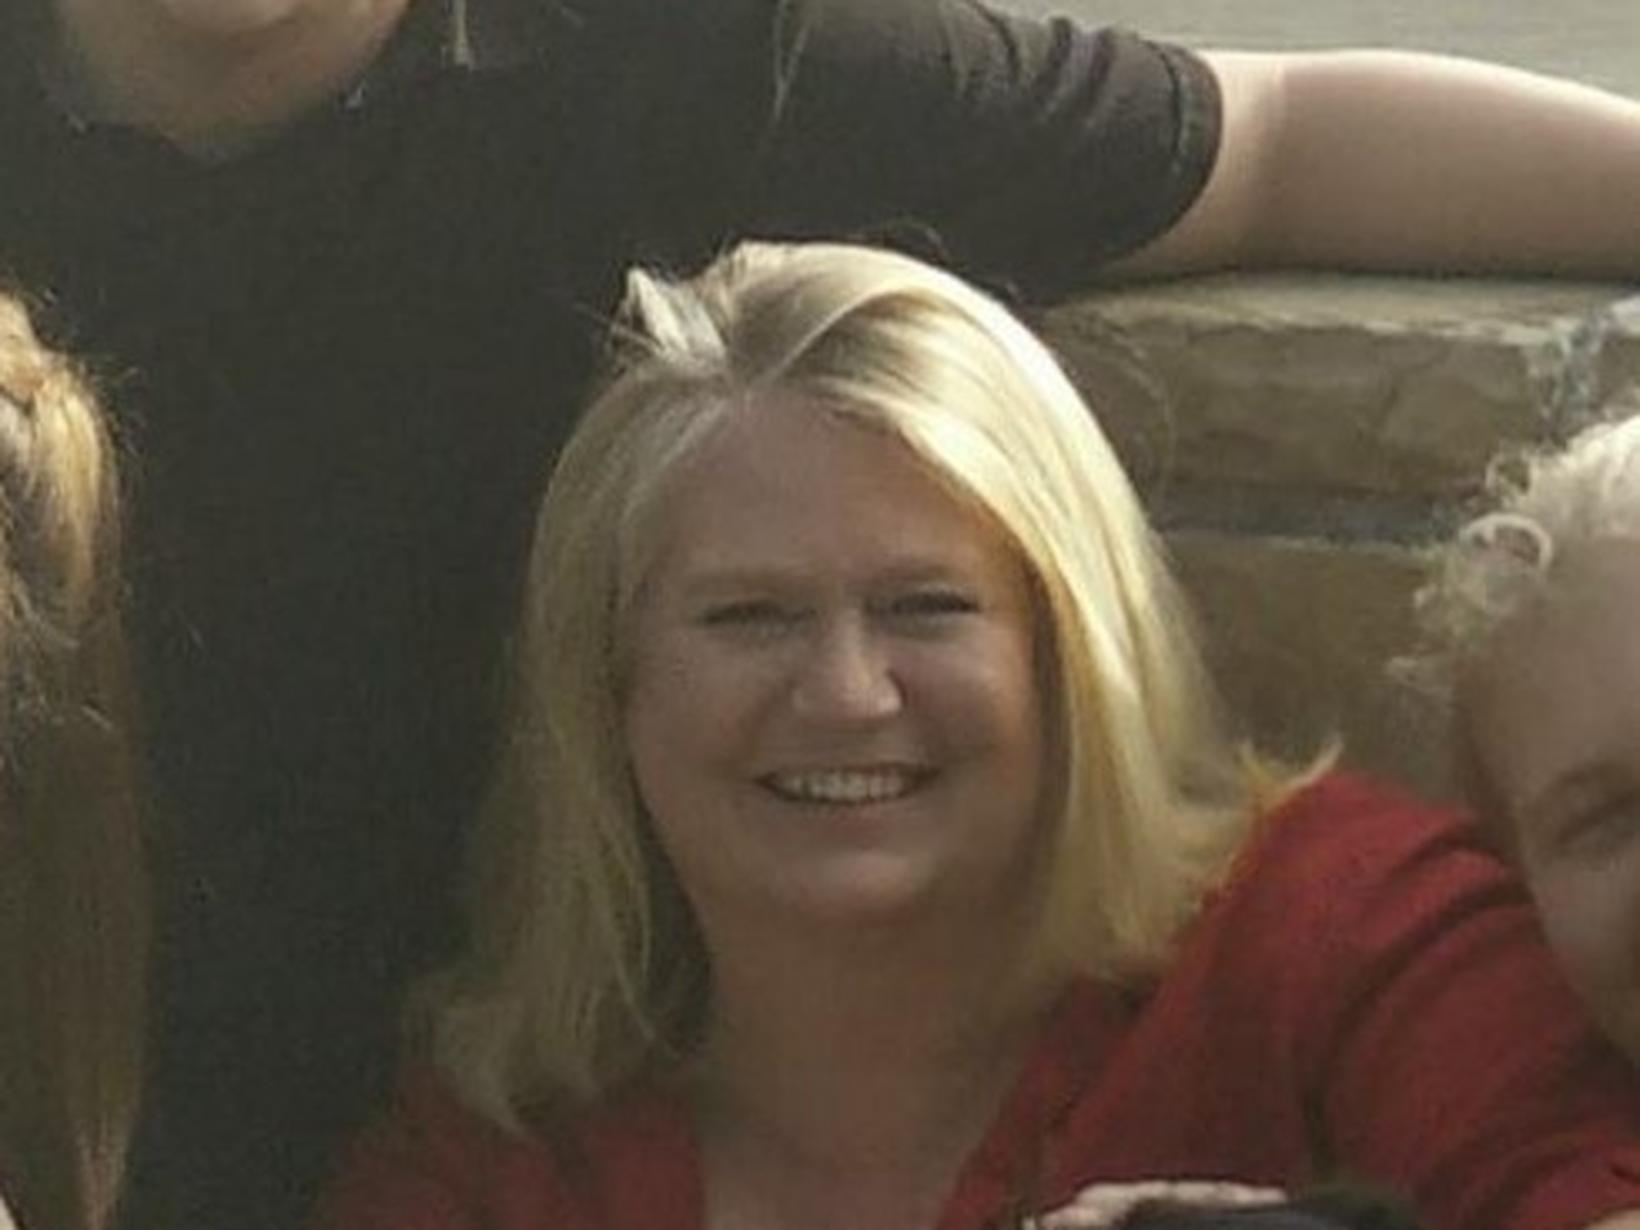 Lori from Salt Lake City, Utah, United States